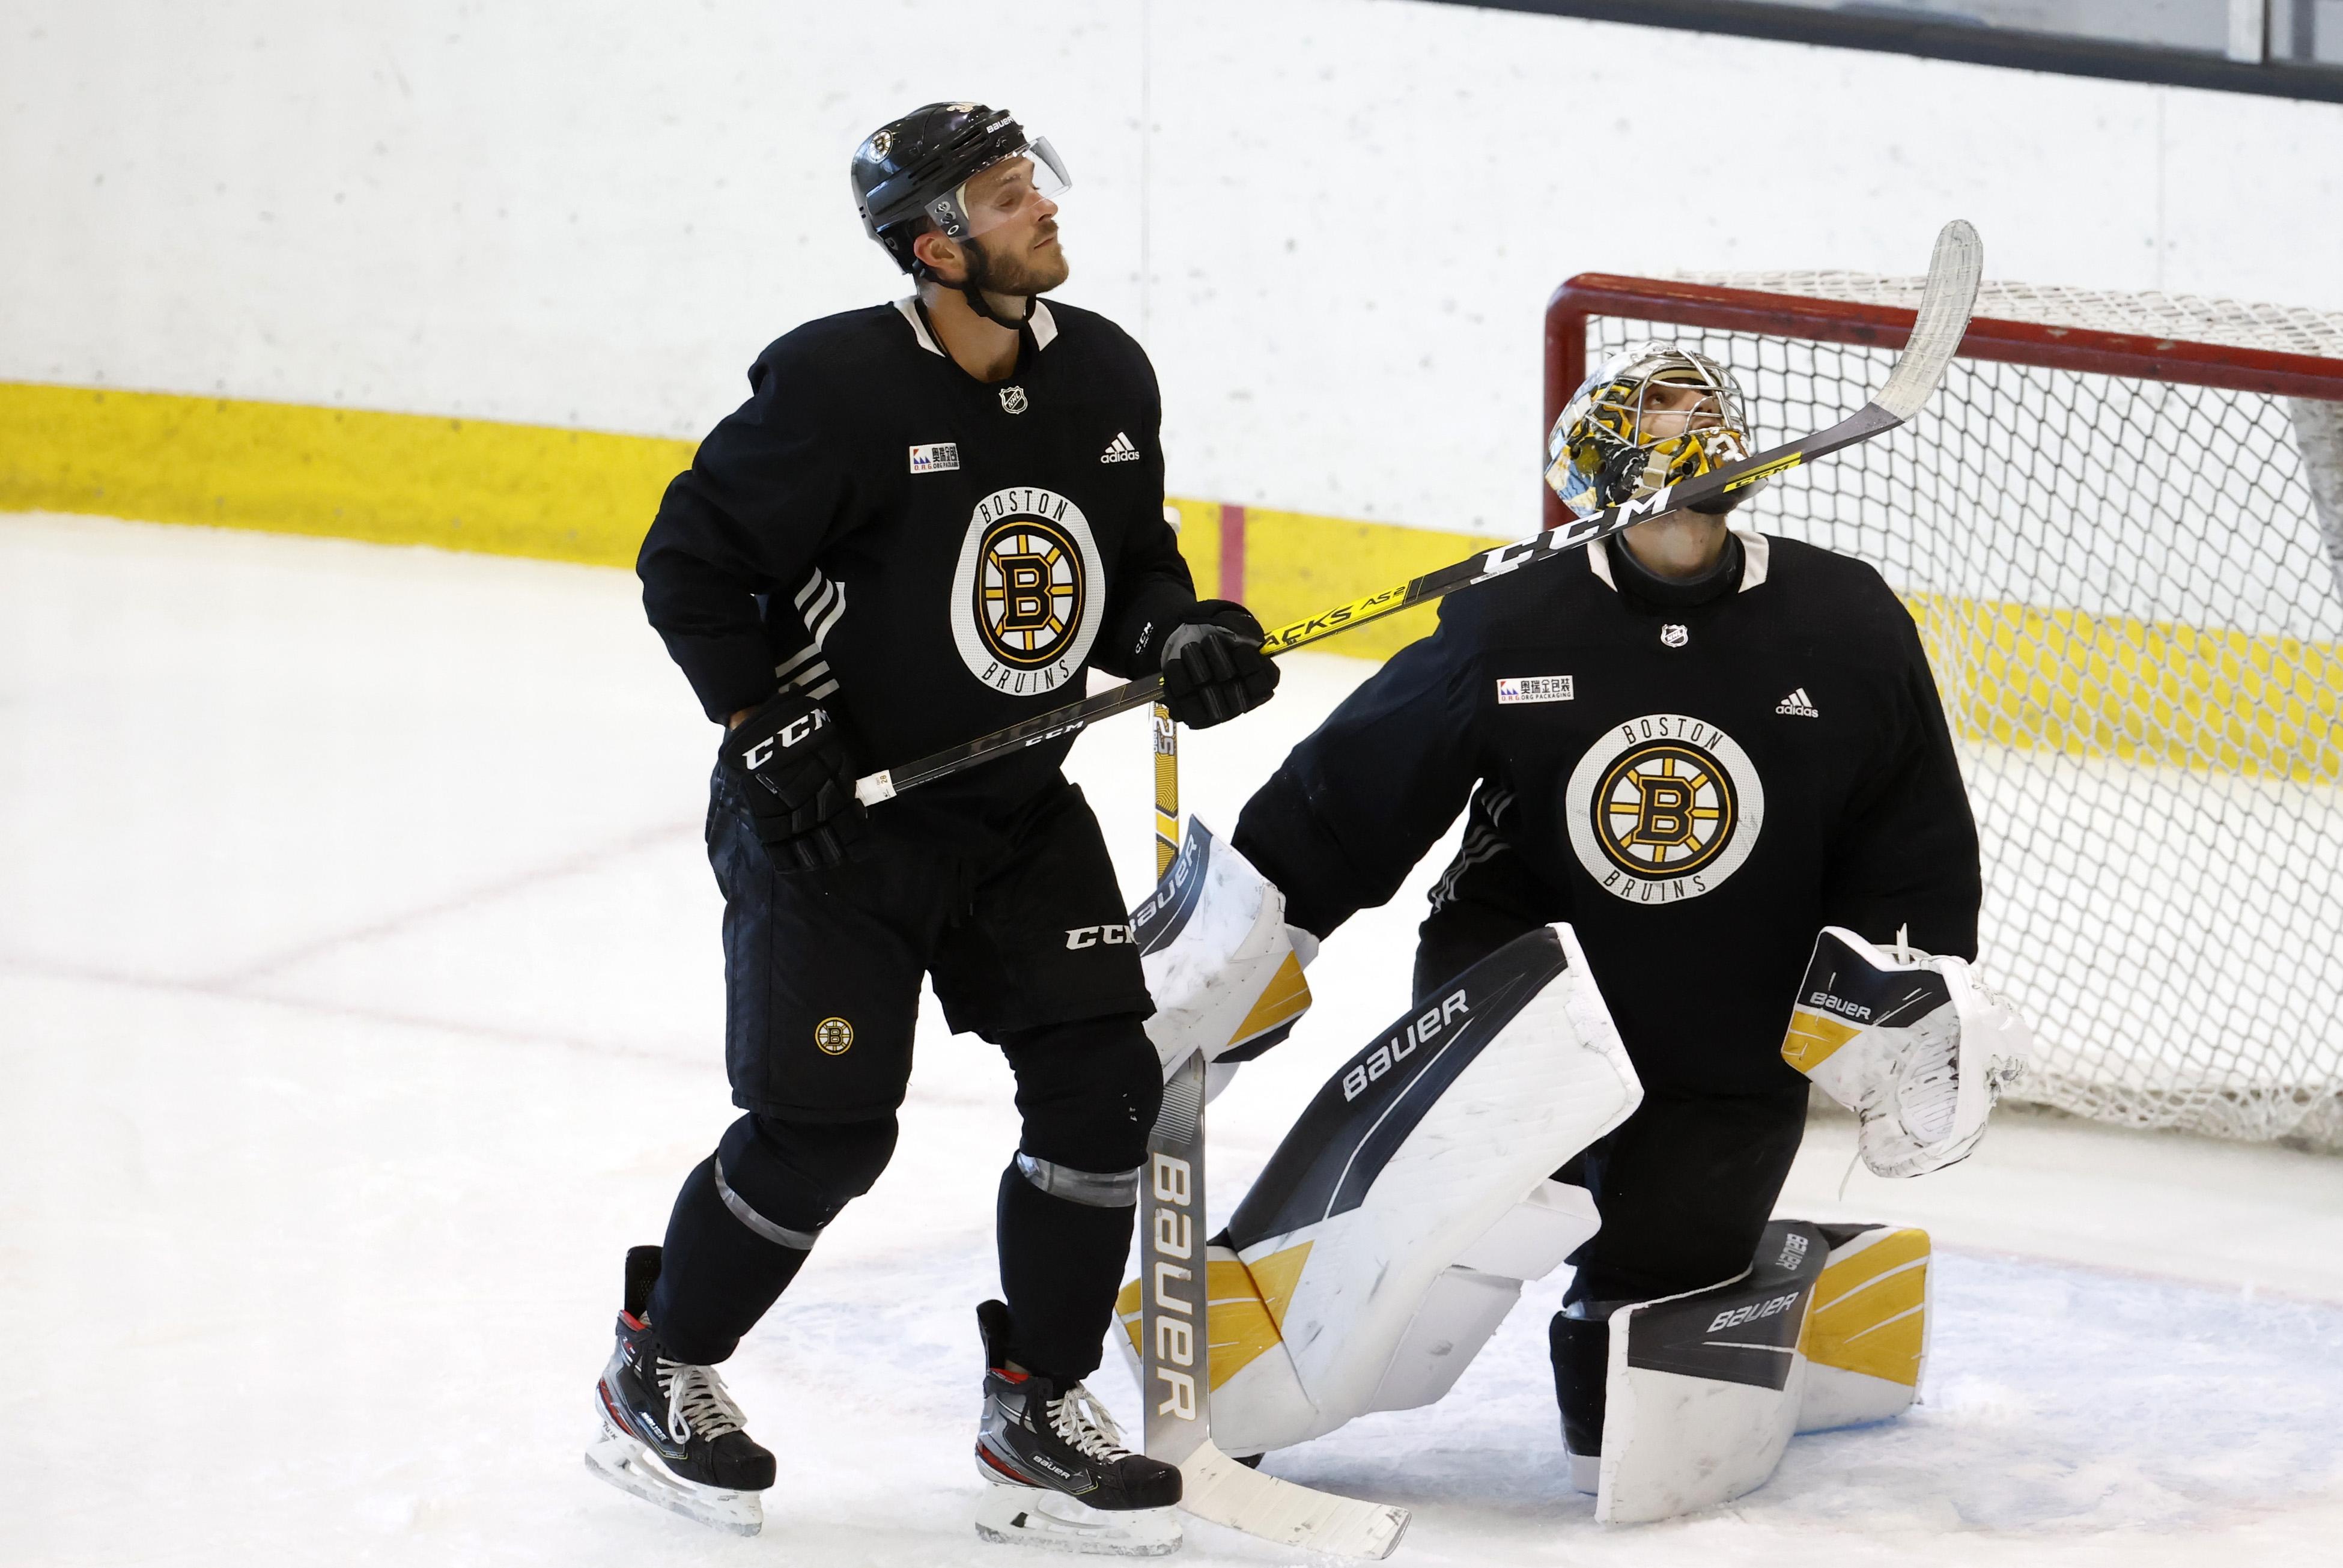 NHL: JUL 18 Bruins Training Camp